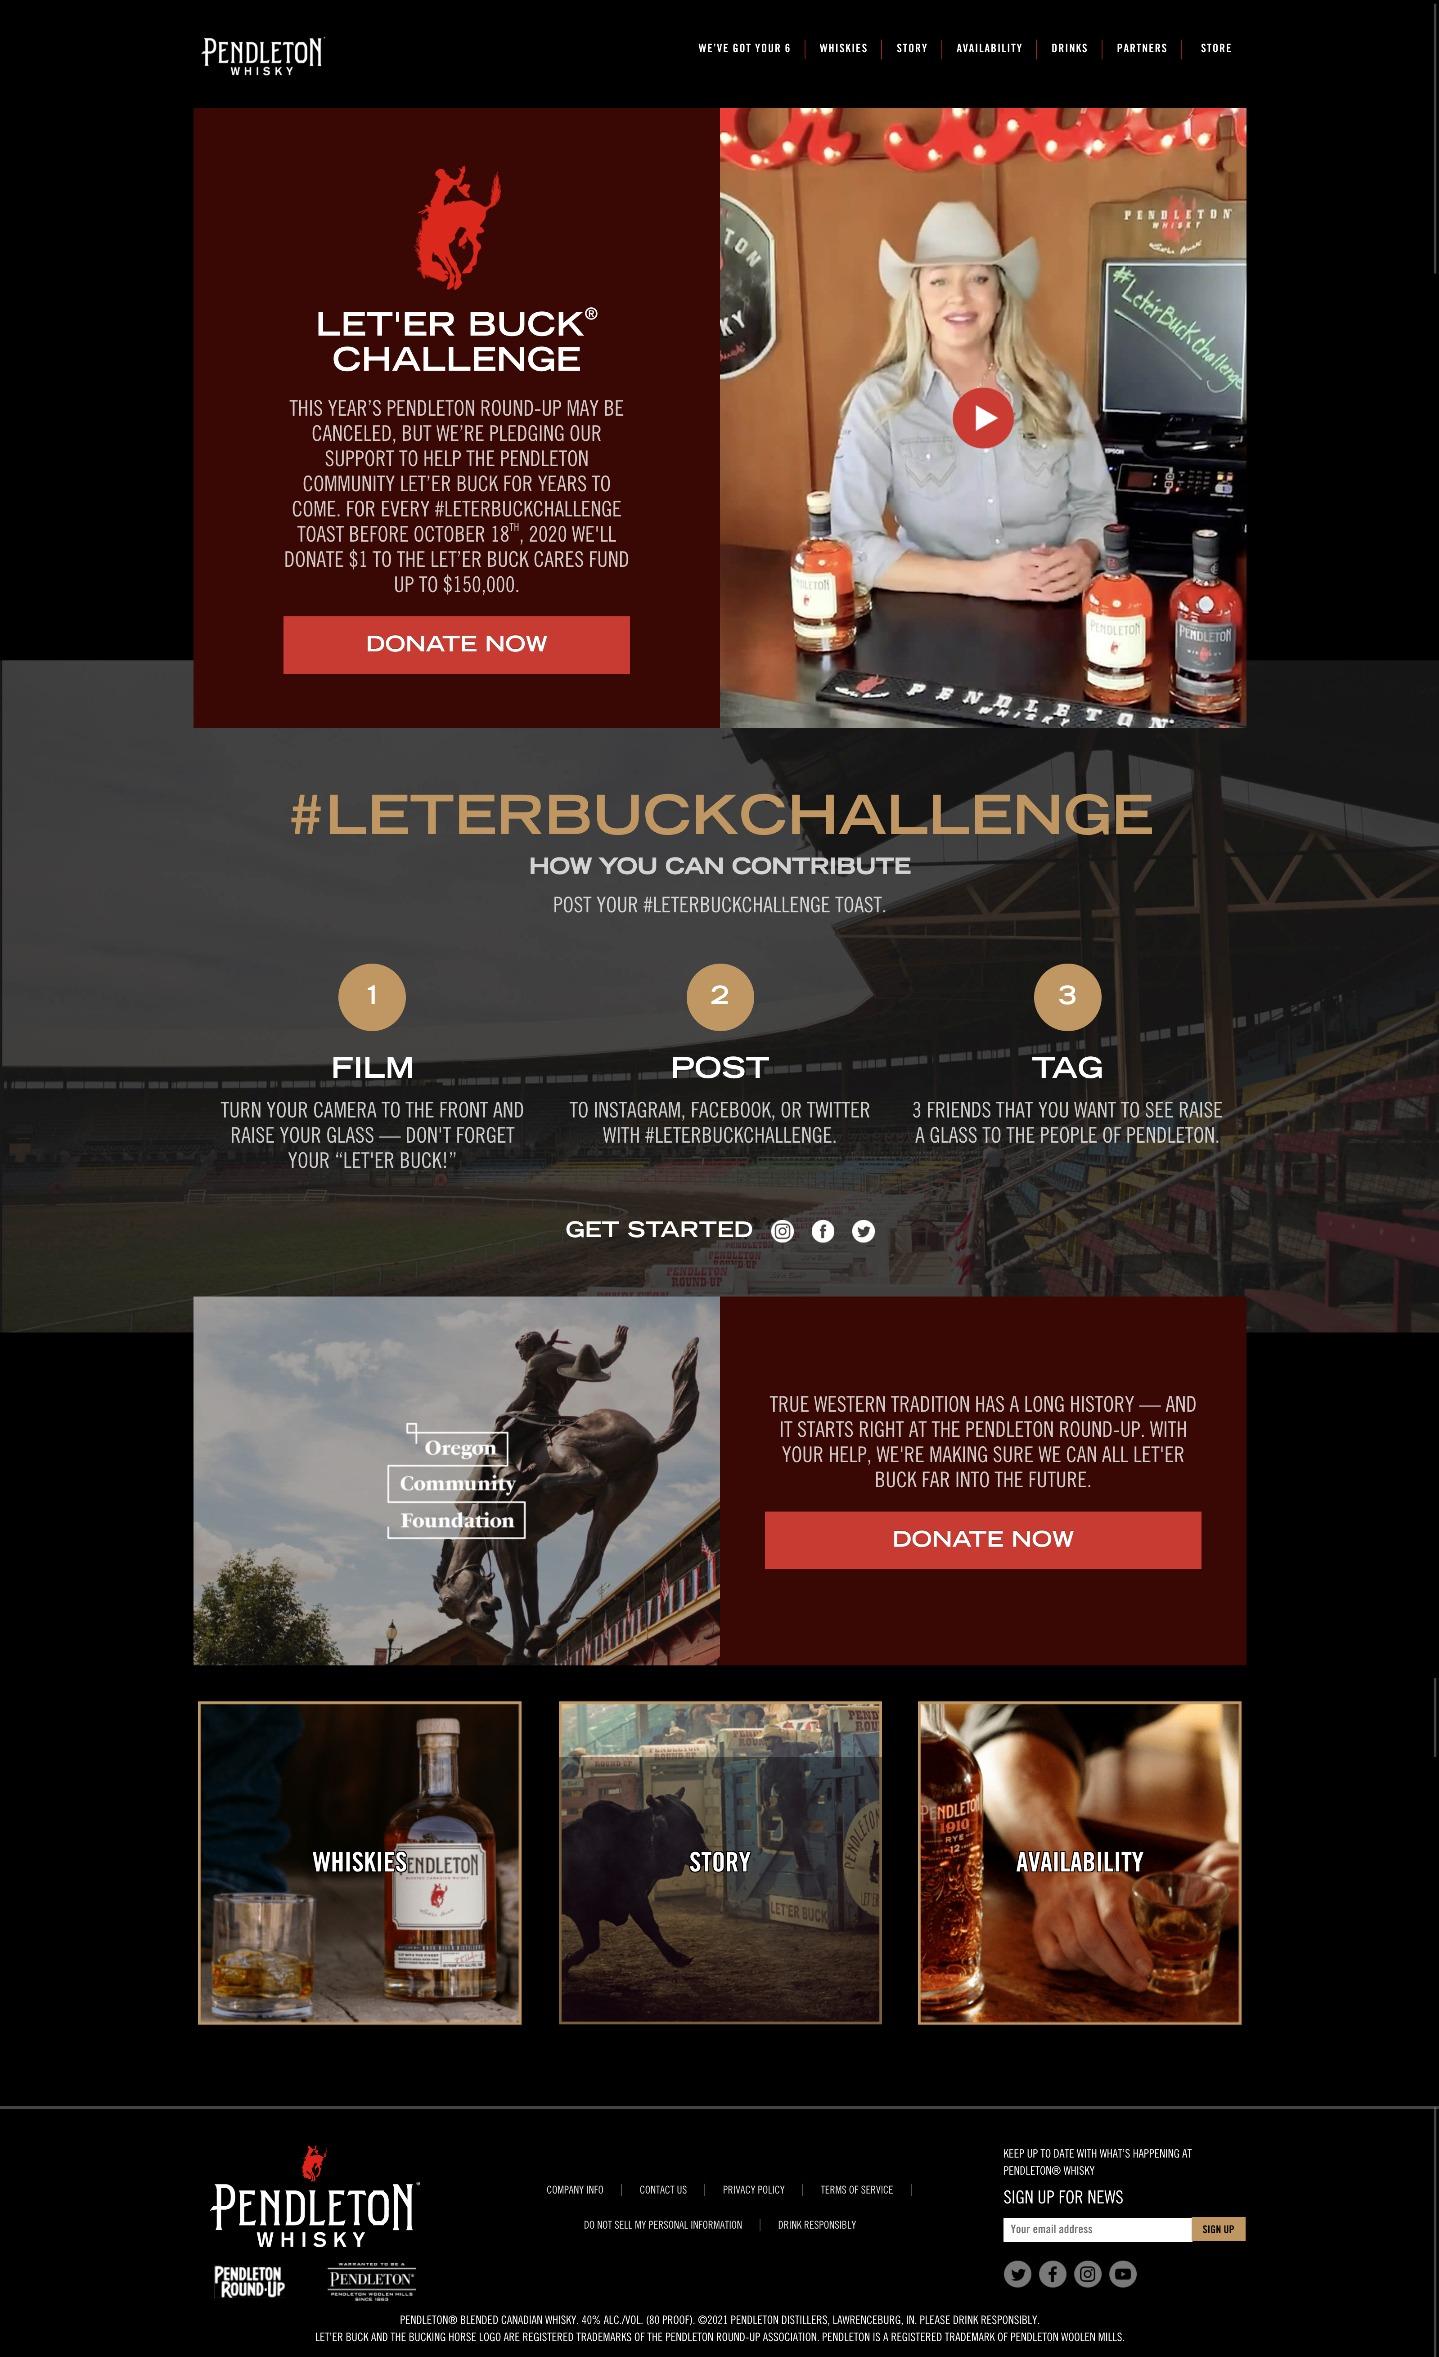 screencapture-pendletonwhisky-leter-buck-challenge-2021-05-23-19_12_21 (2)